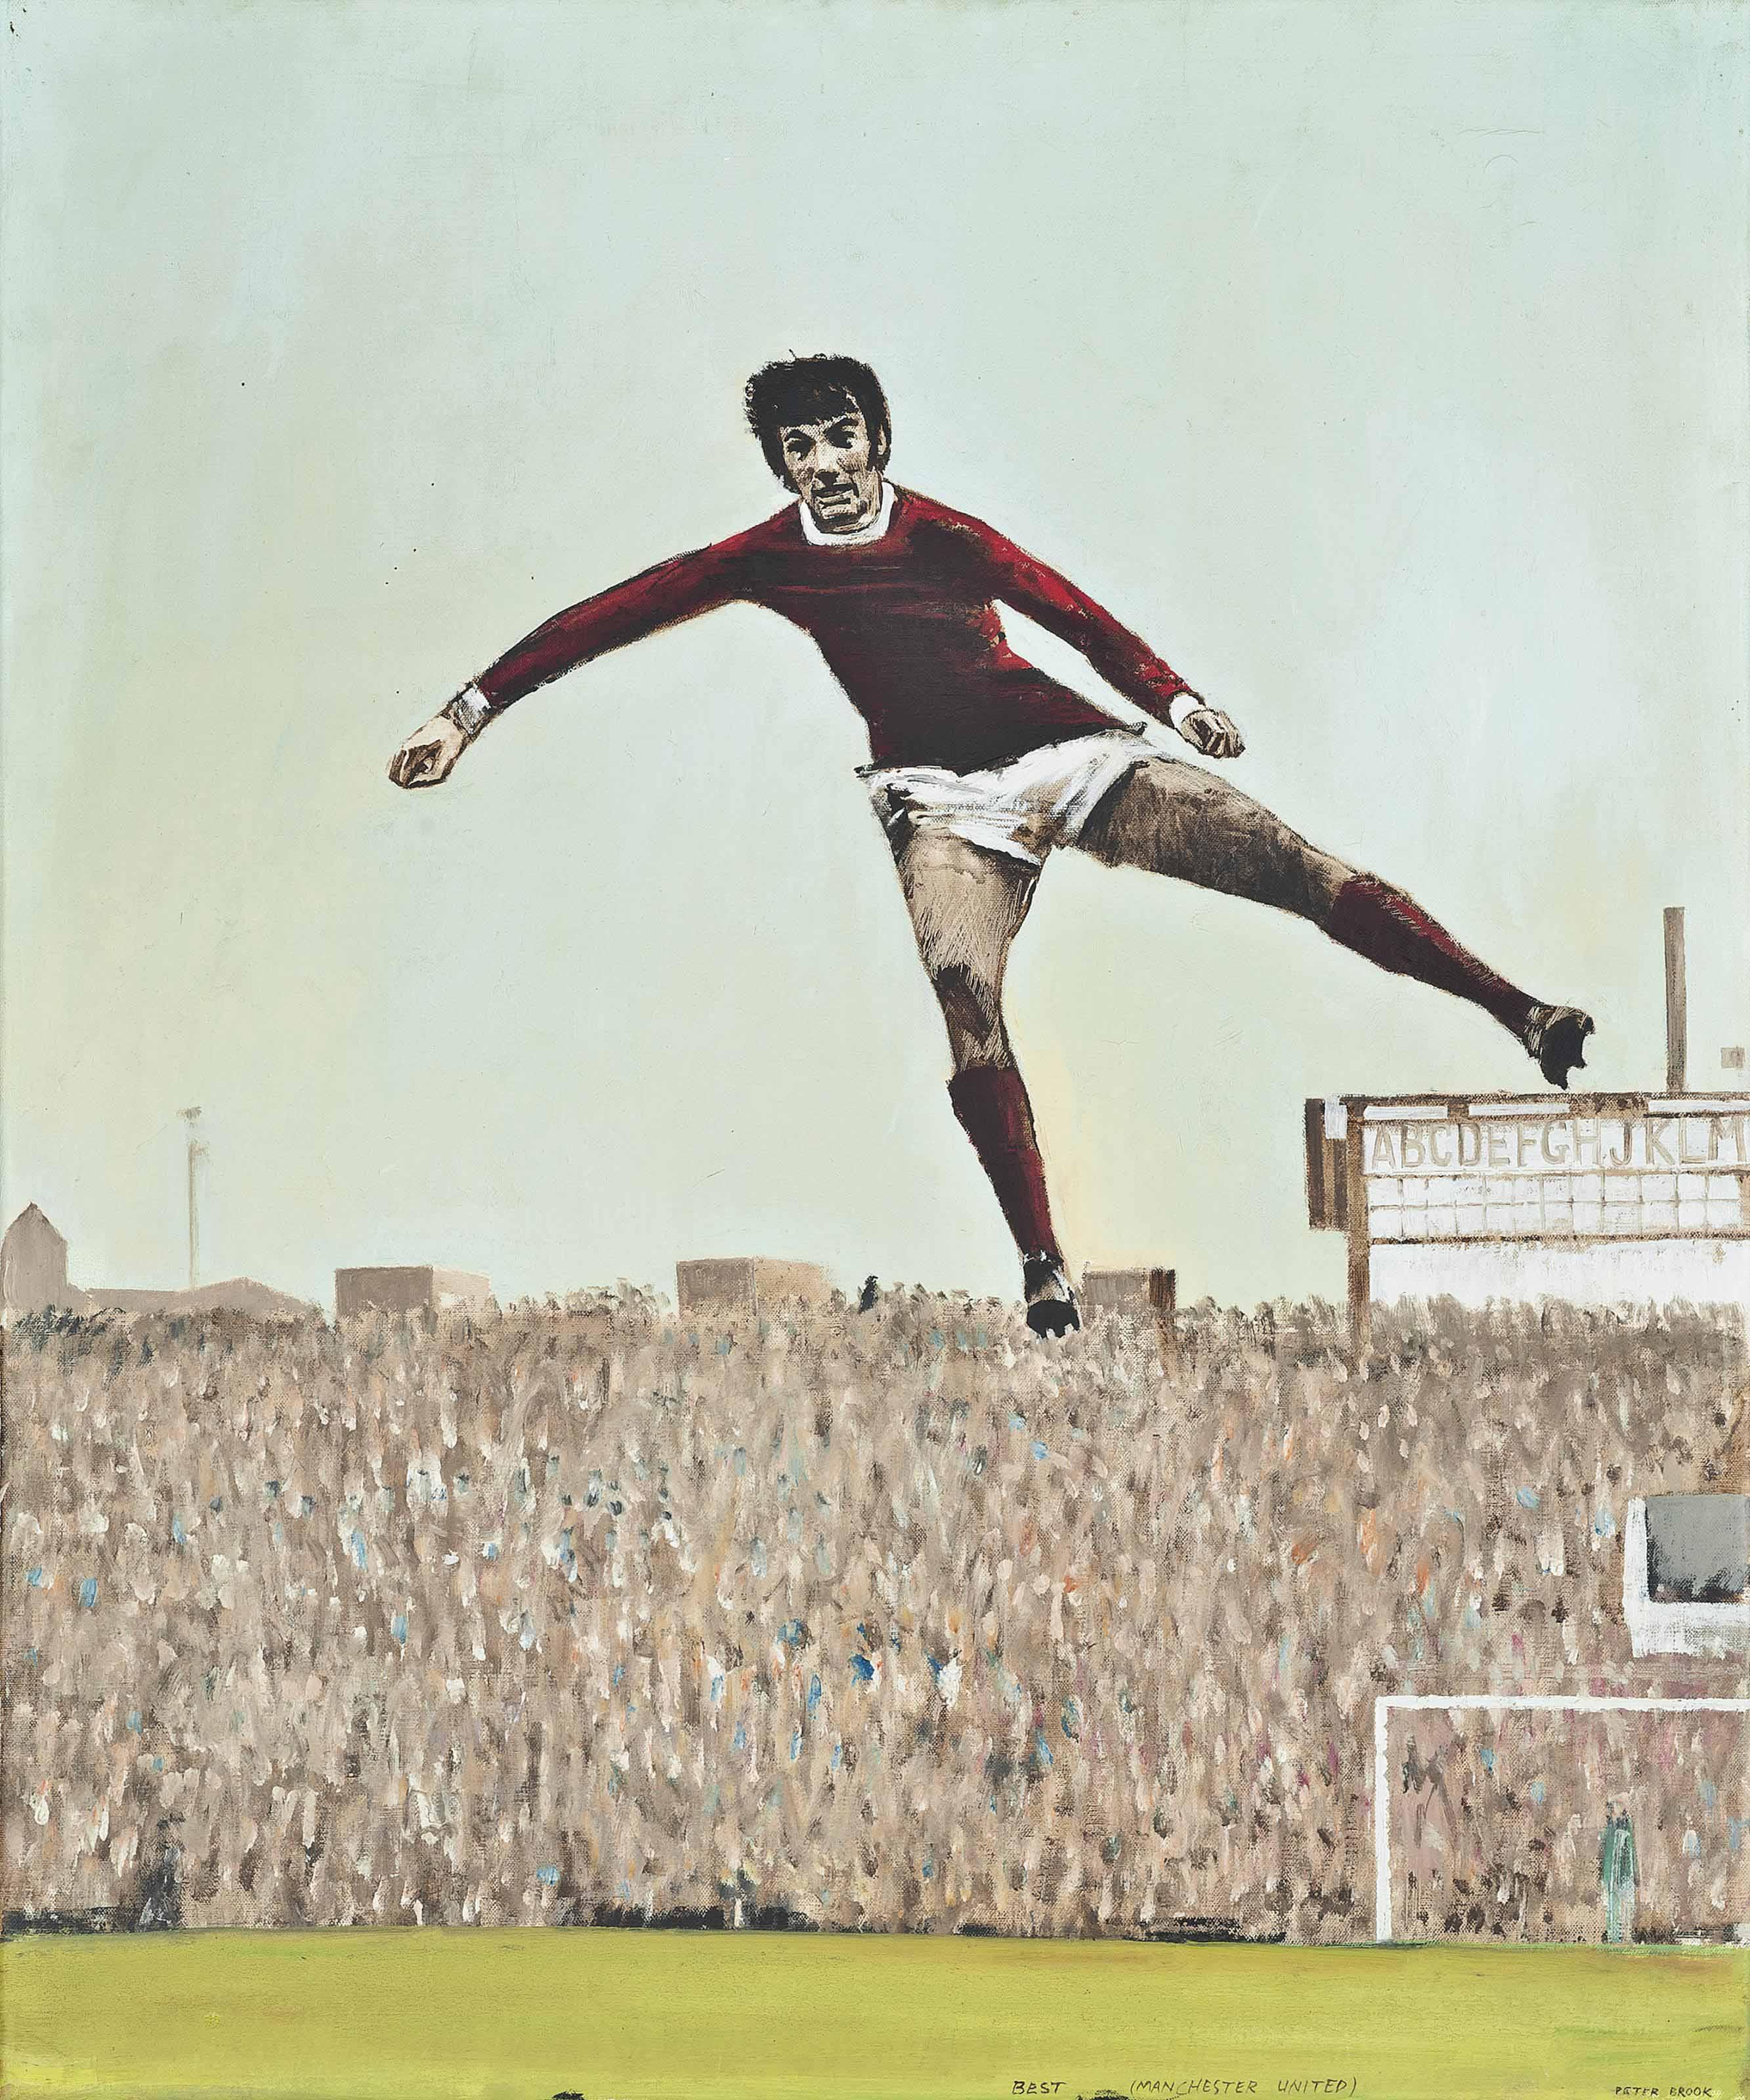 Best (Manchester United)